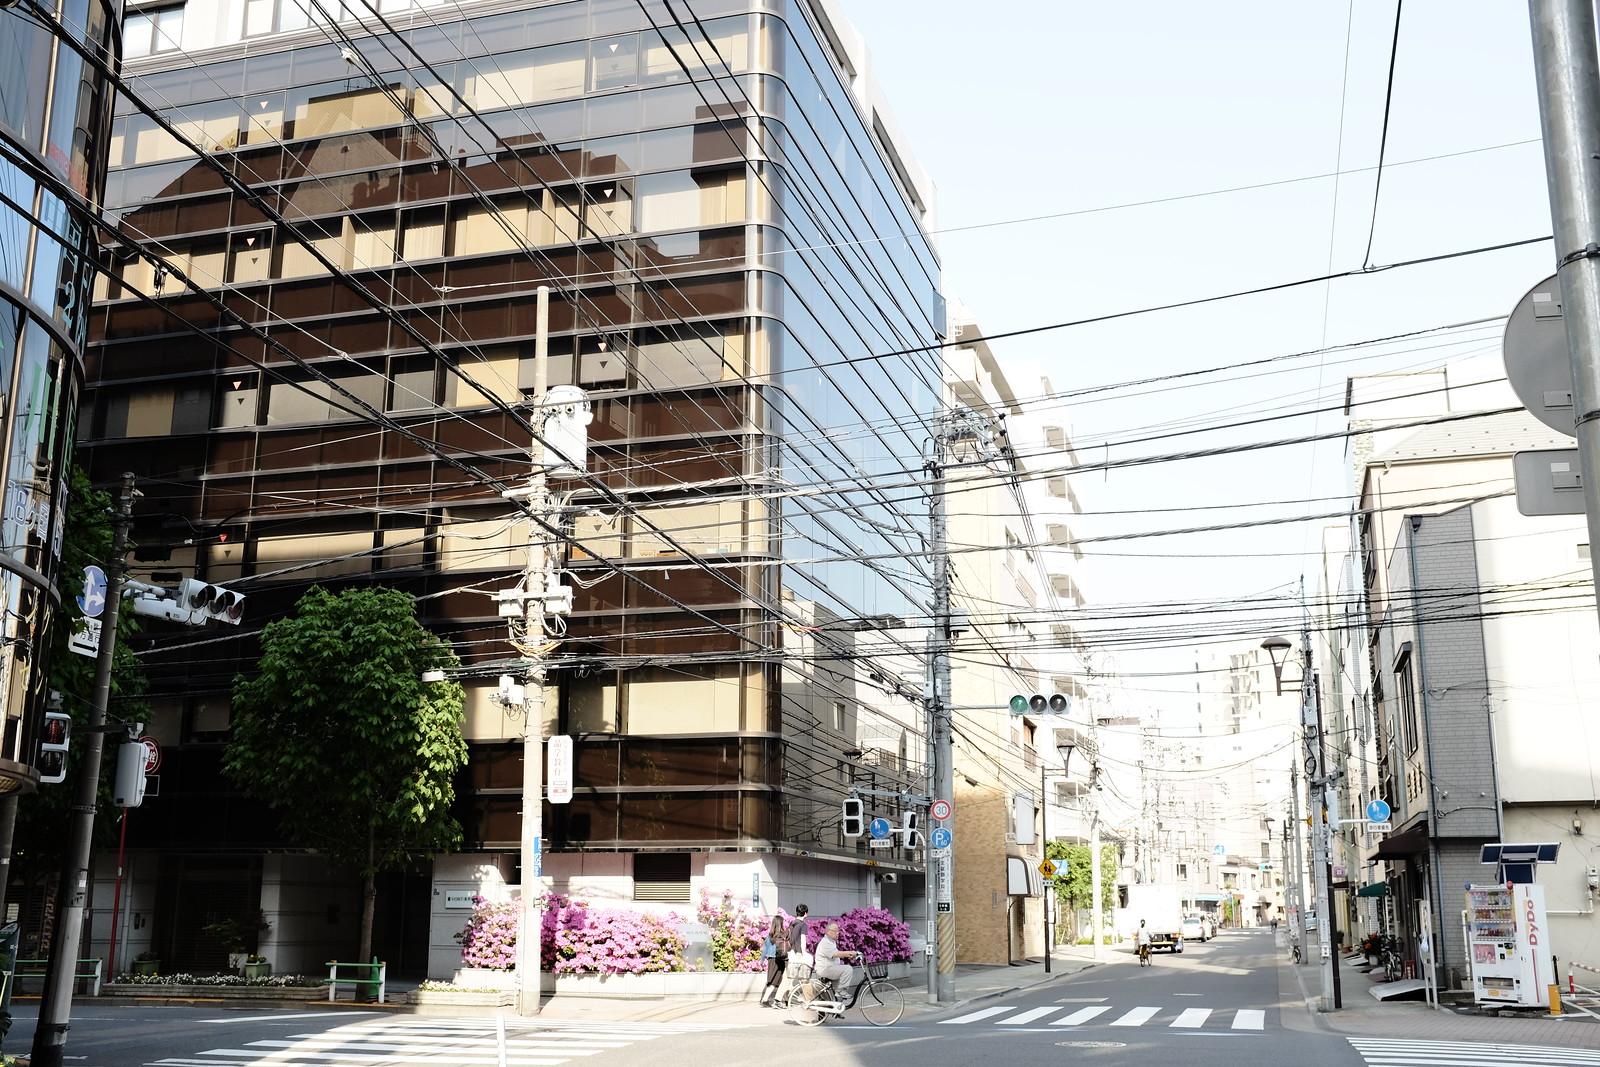 The Akihabara to Kuramae photo by FUJIFILM X100S